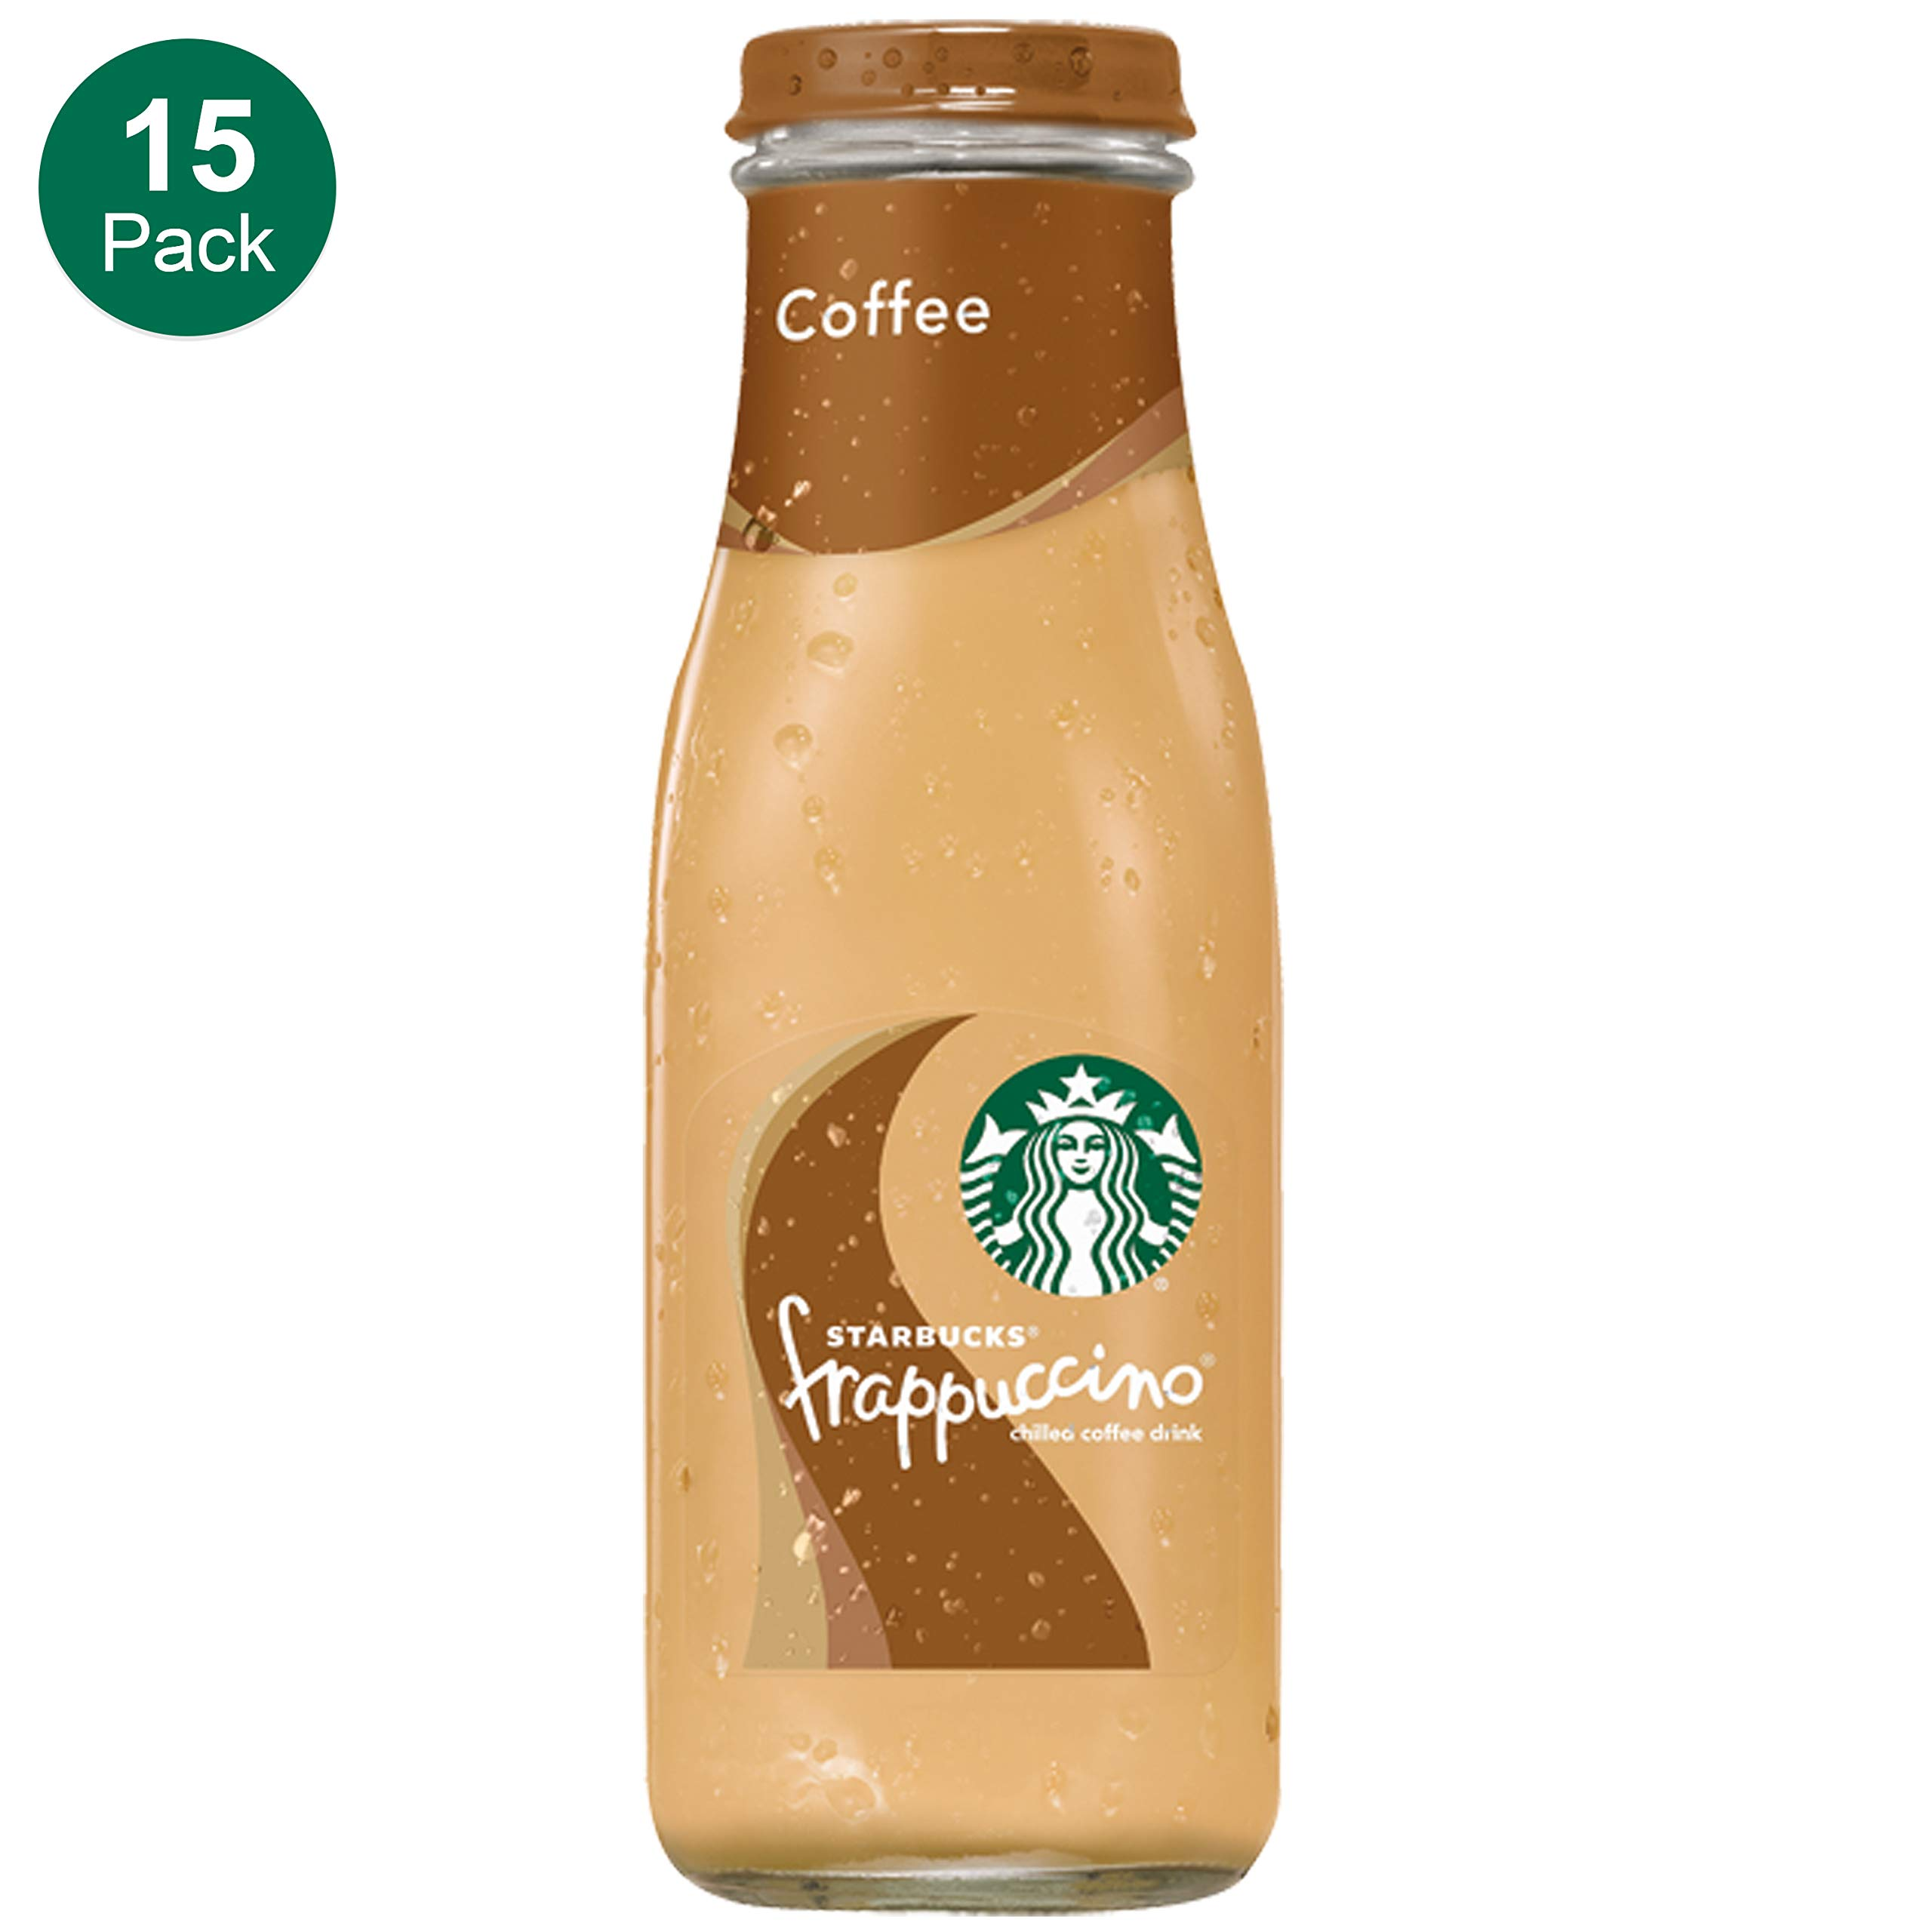 Starbucks Frappuccino, Coffee, 9.5 Fl. Oz (15 Count) Glass Bottles by Starbucks